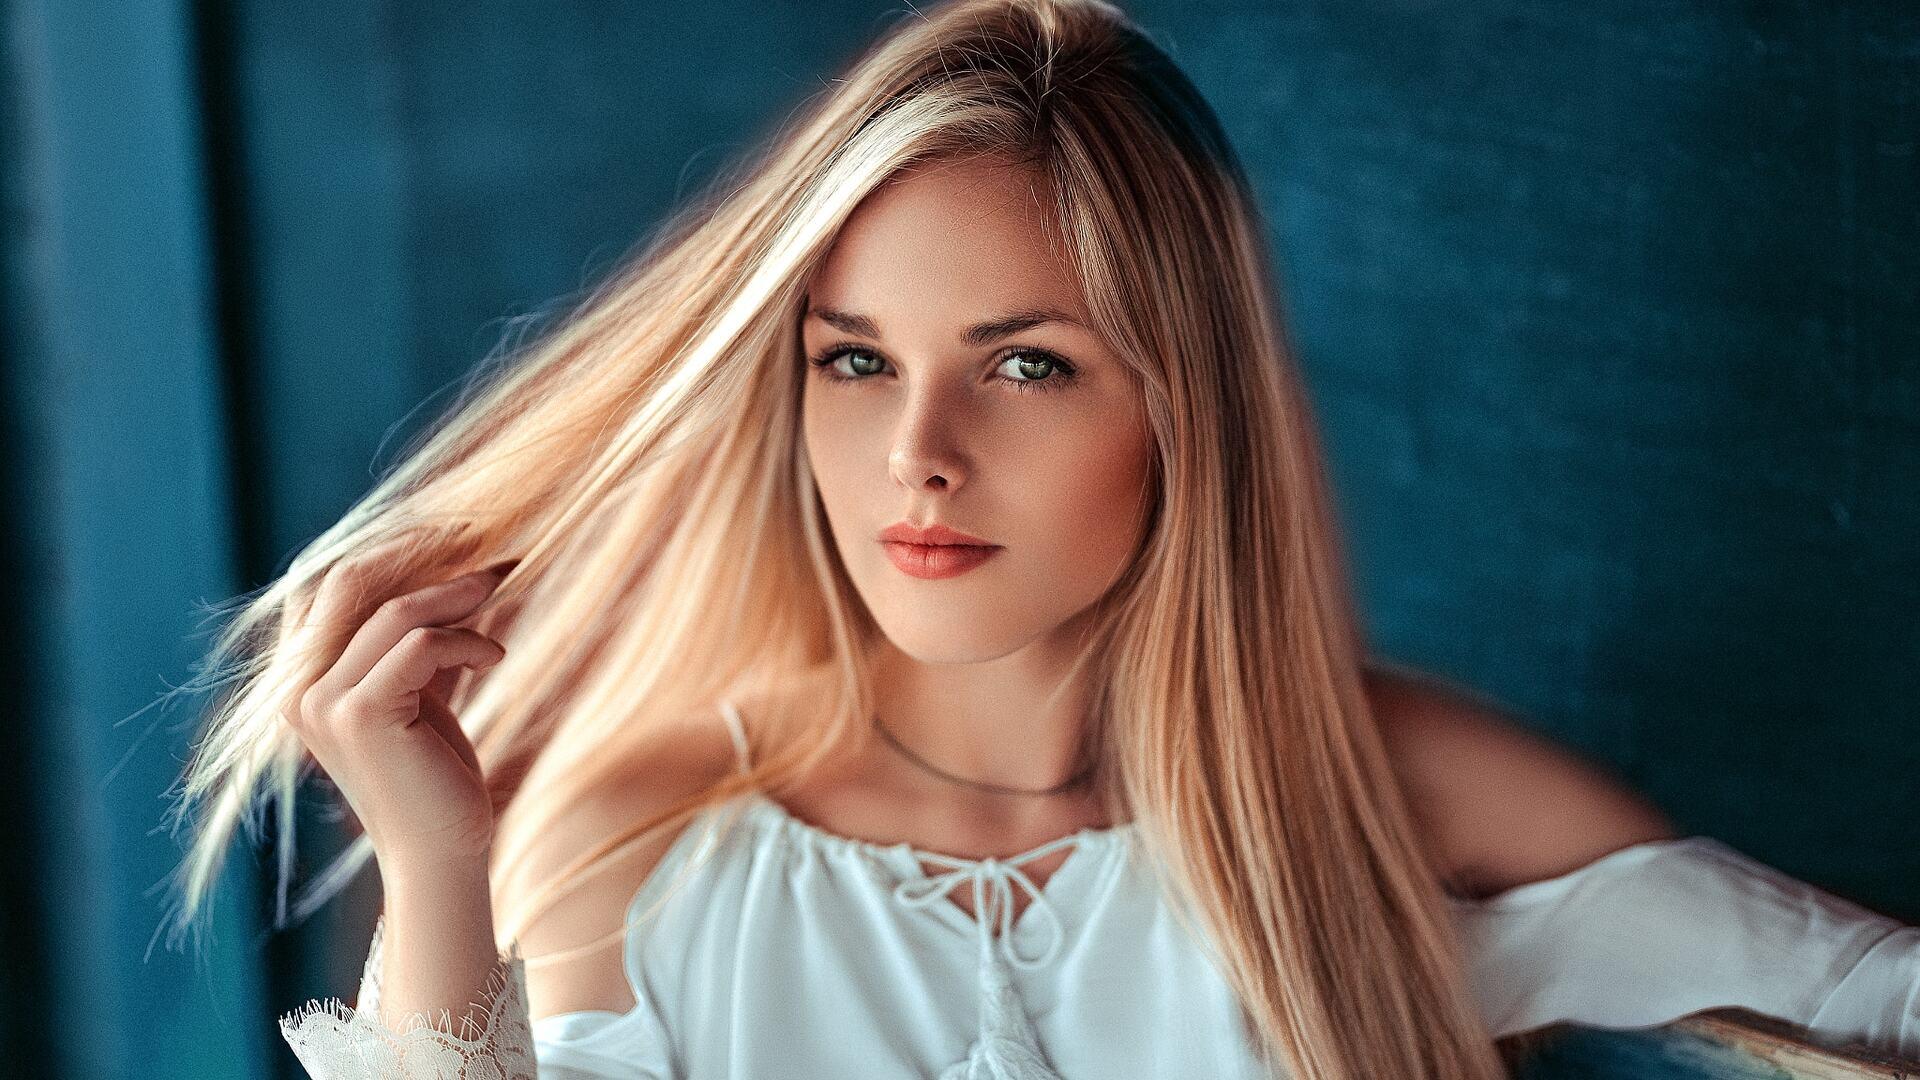 1920x1080 Blonde Cute Girl Laptop Full Hd 1080p Hd 4k